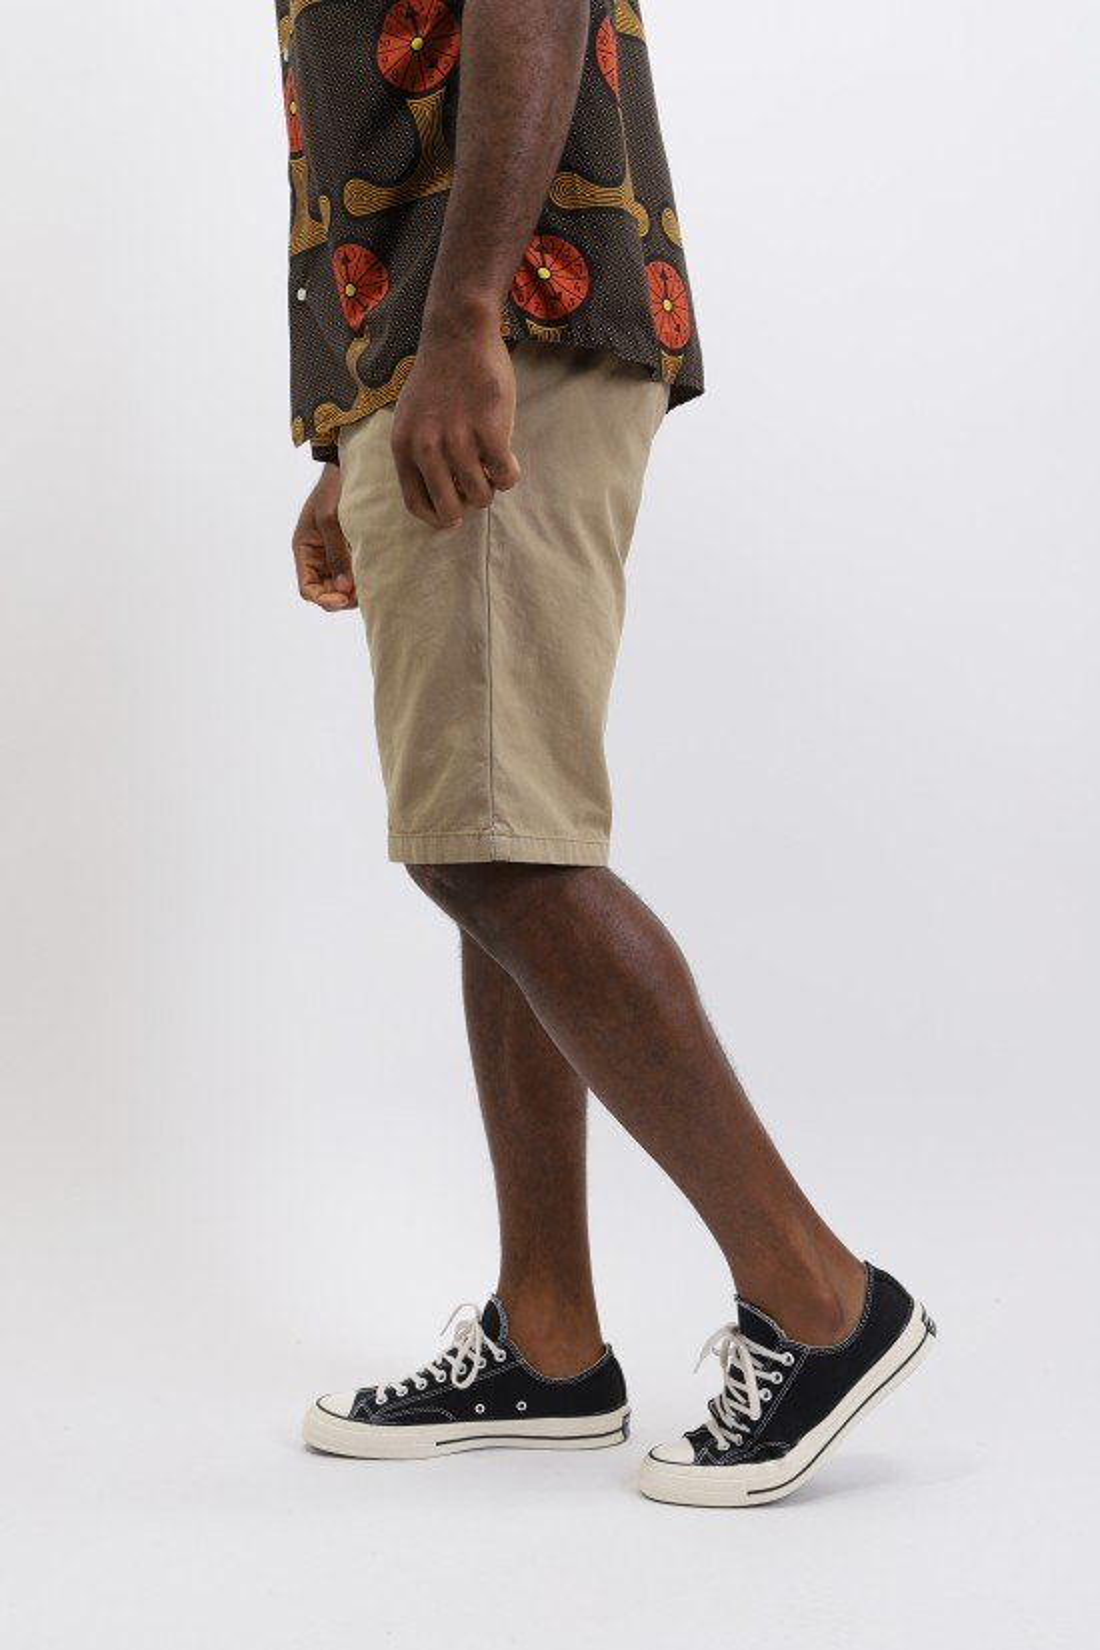 CARHARTT WIP / Johnson short Leather